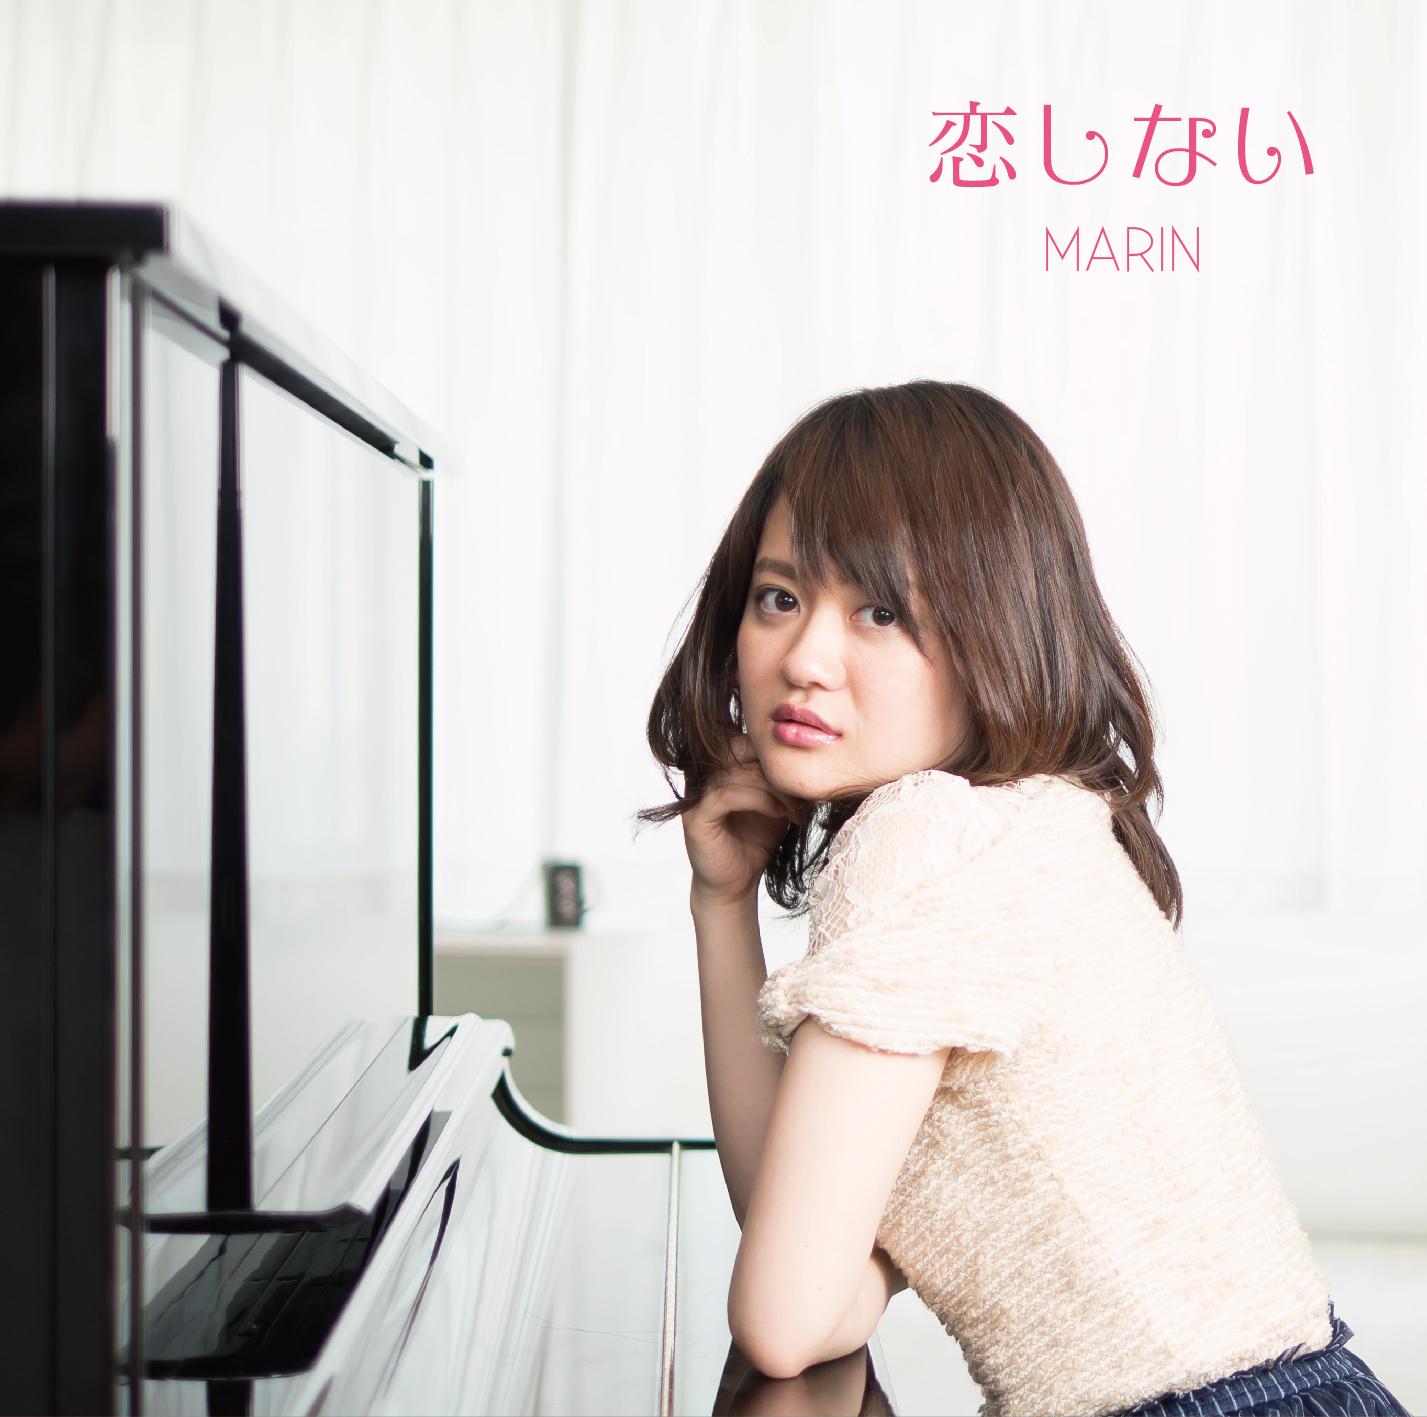 MARIN「恋しない」【CD Jacket】